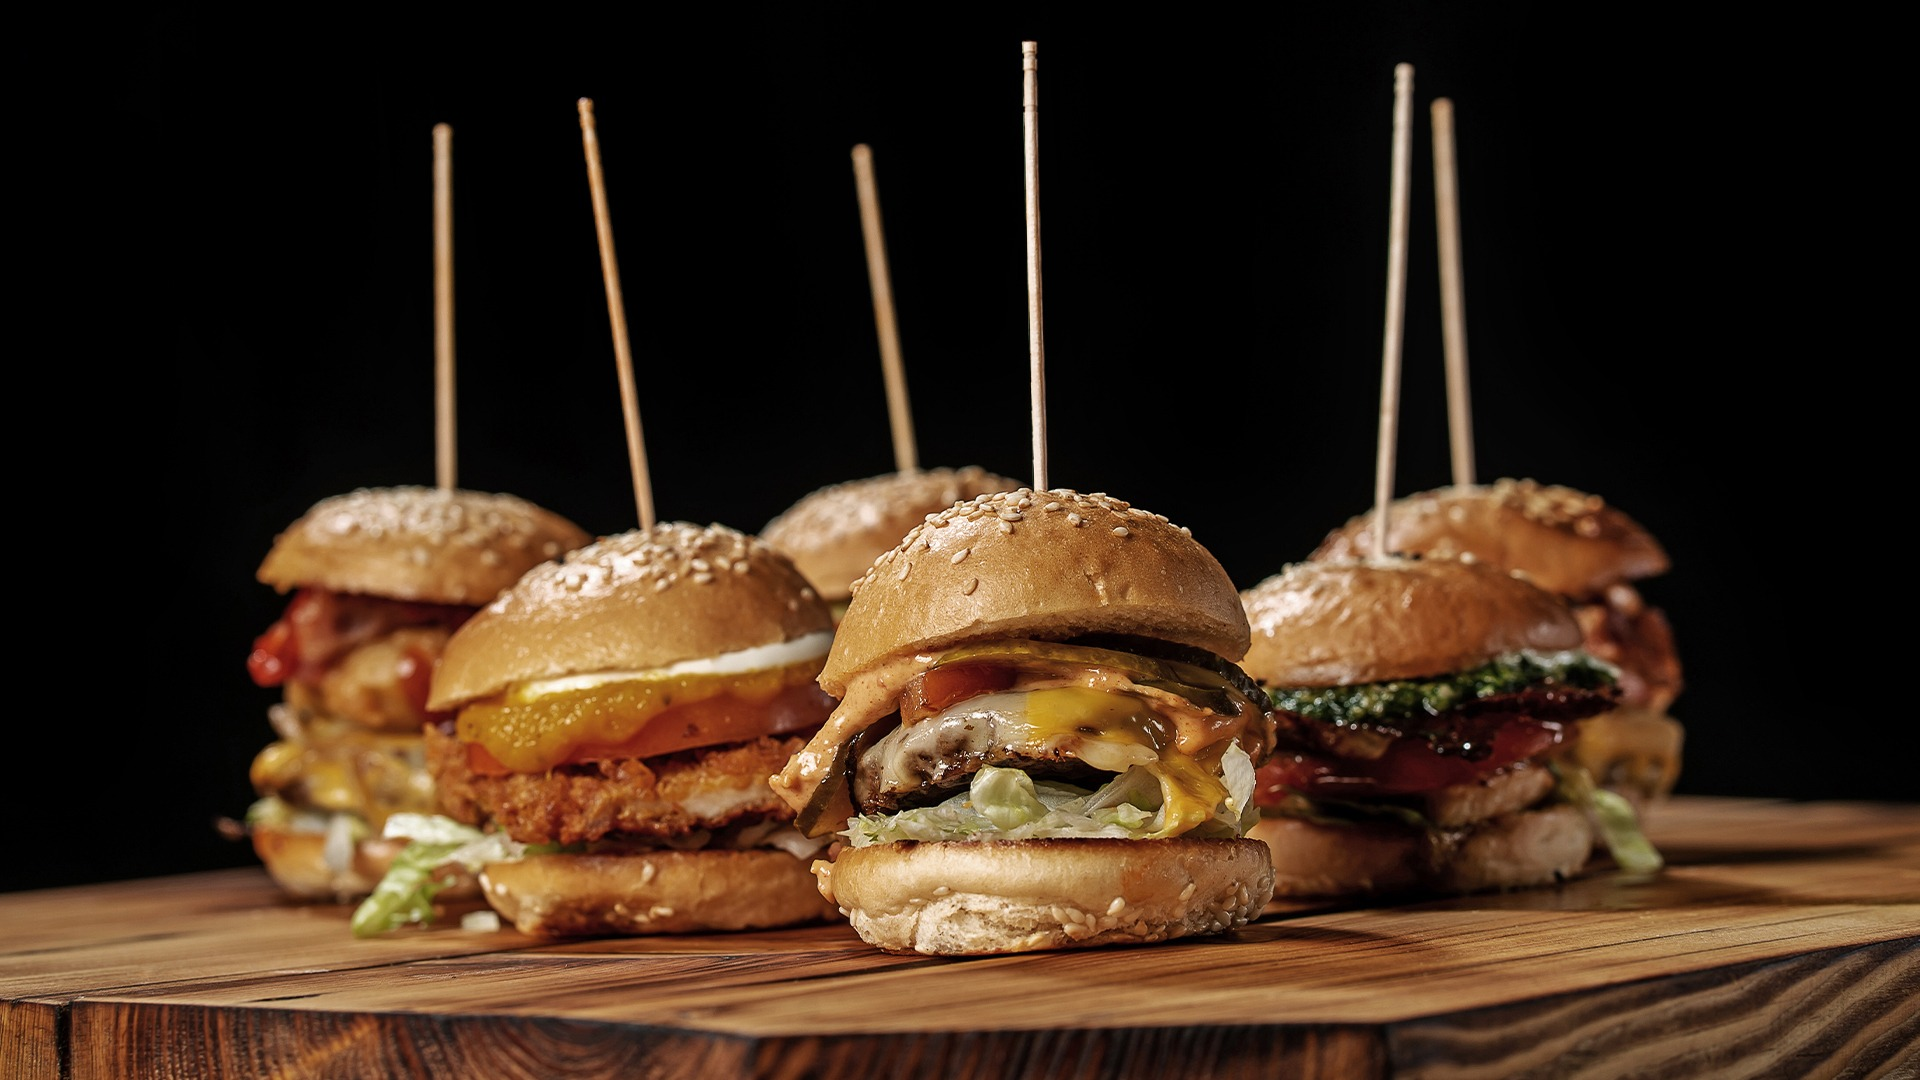 Burgerglück Hamburger Sampler